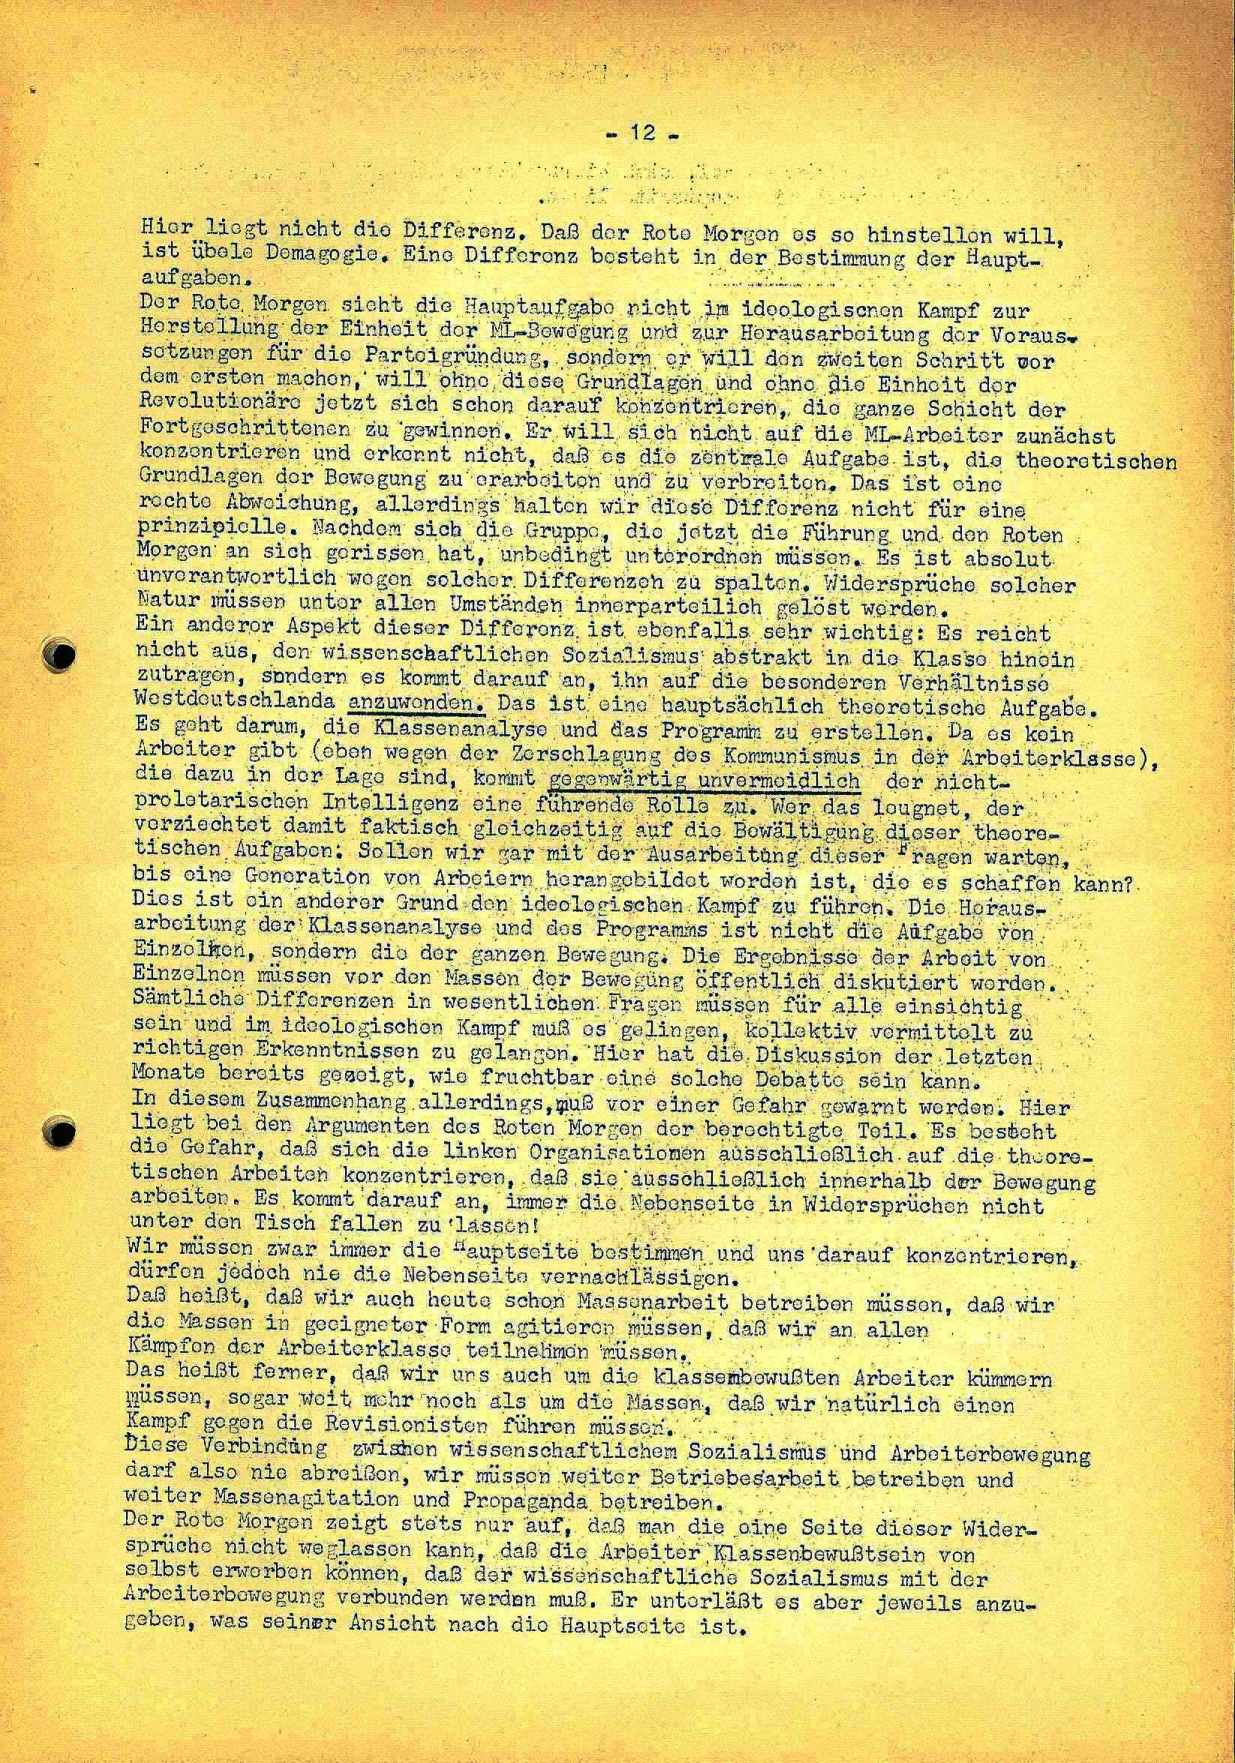 Weinfurth075